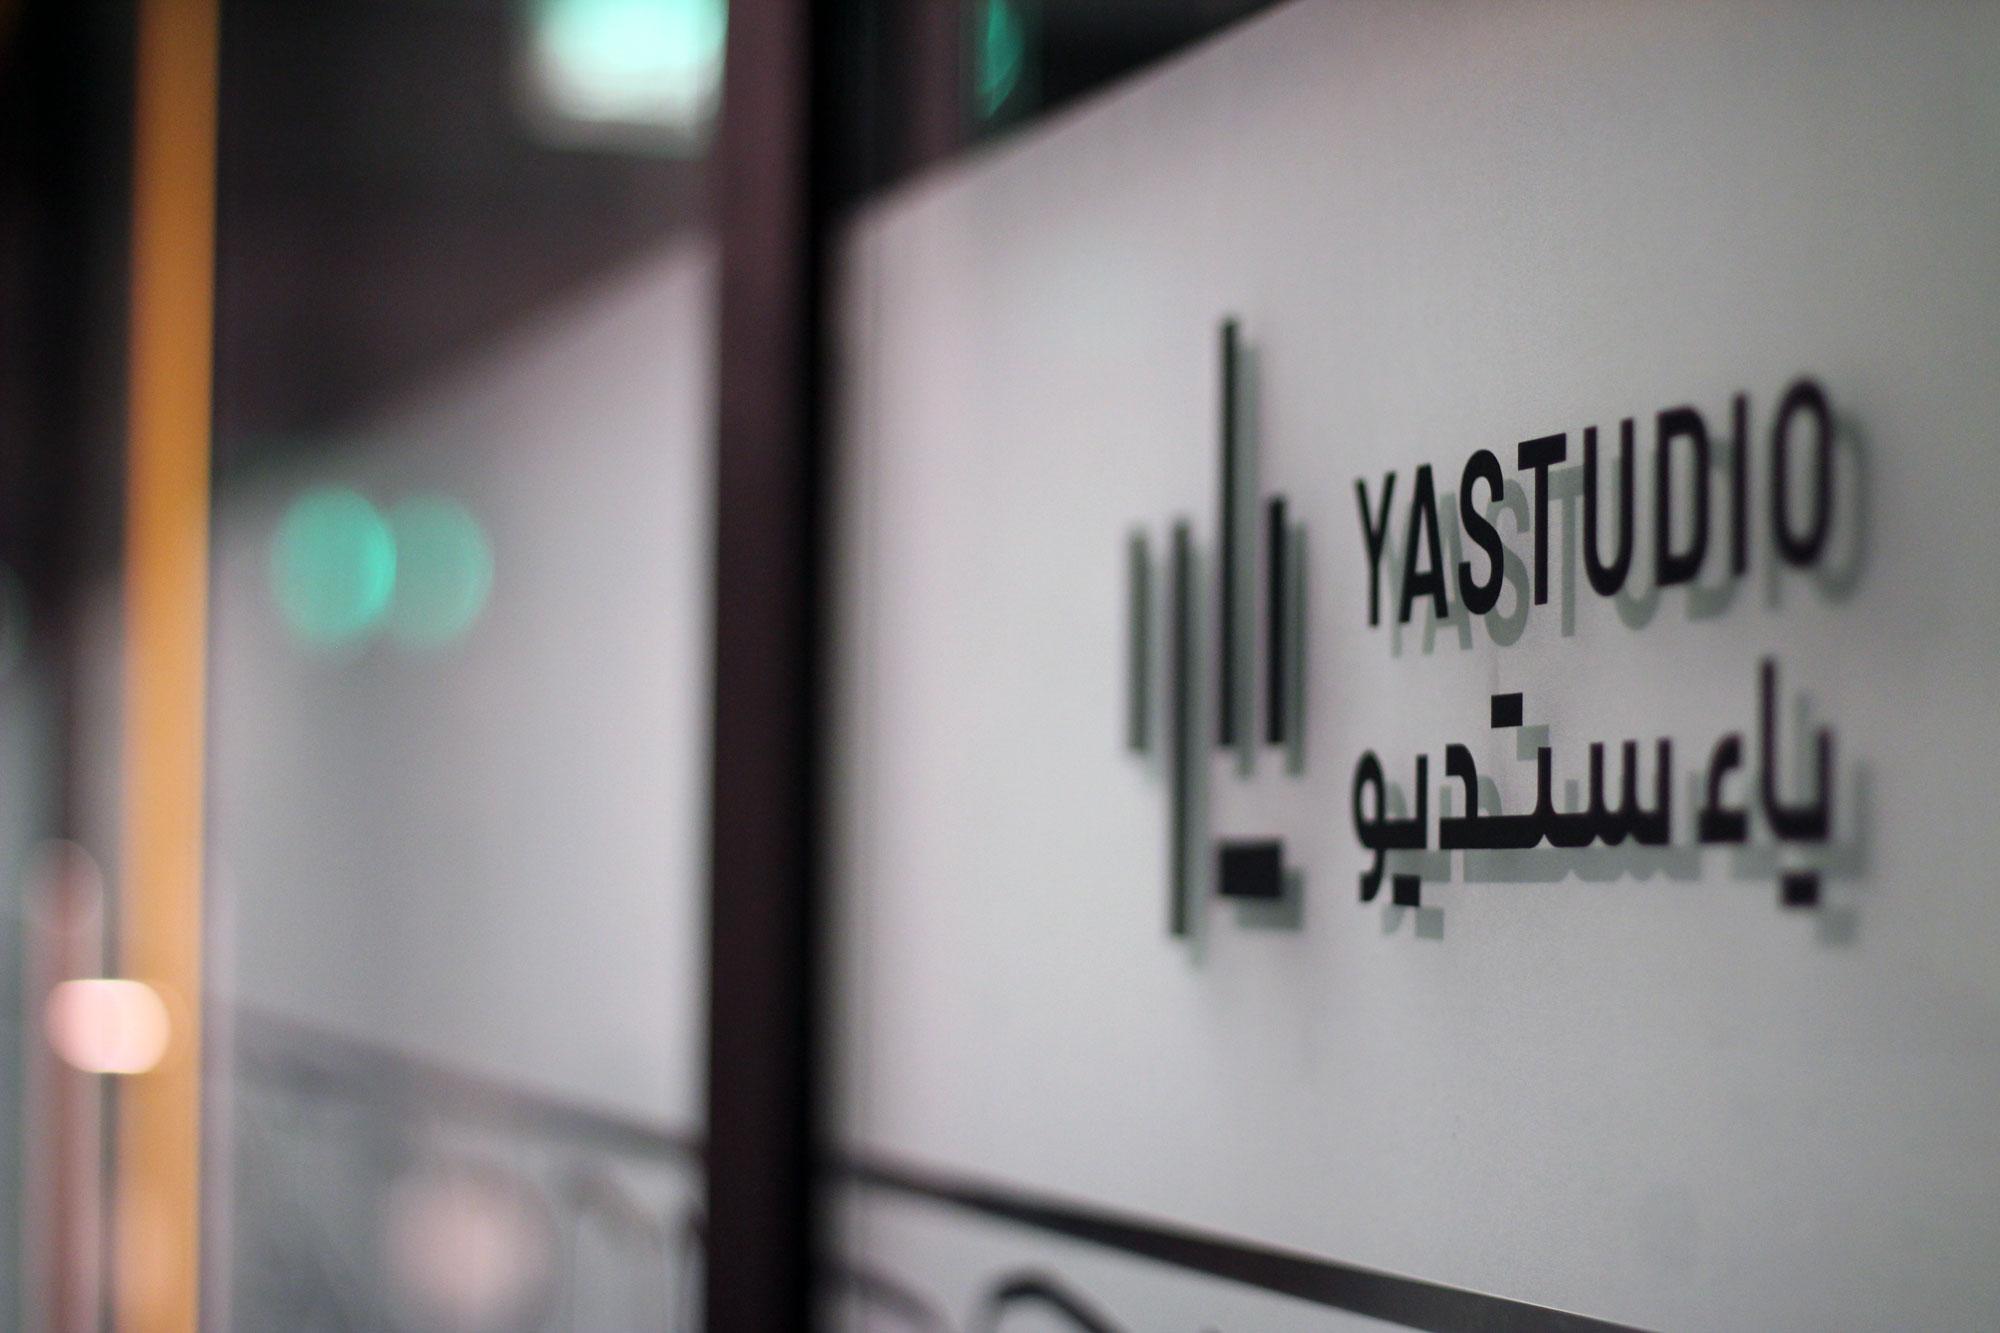 office-yastudio